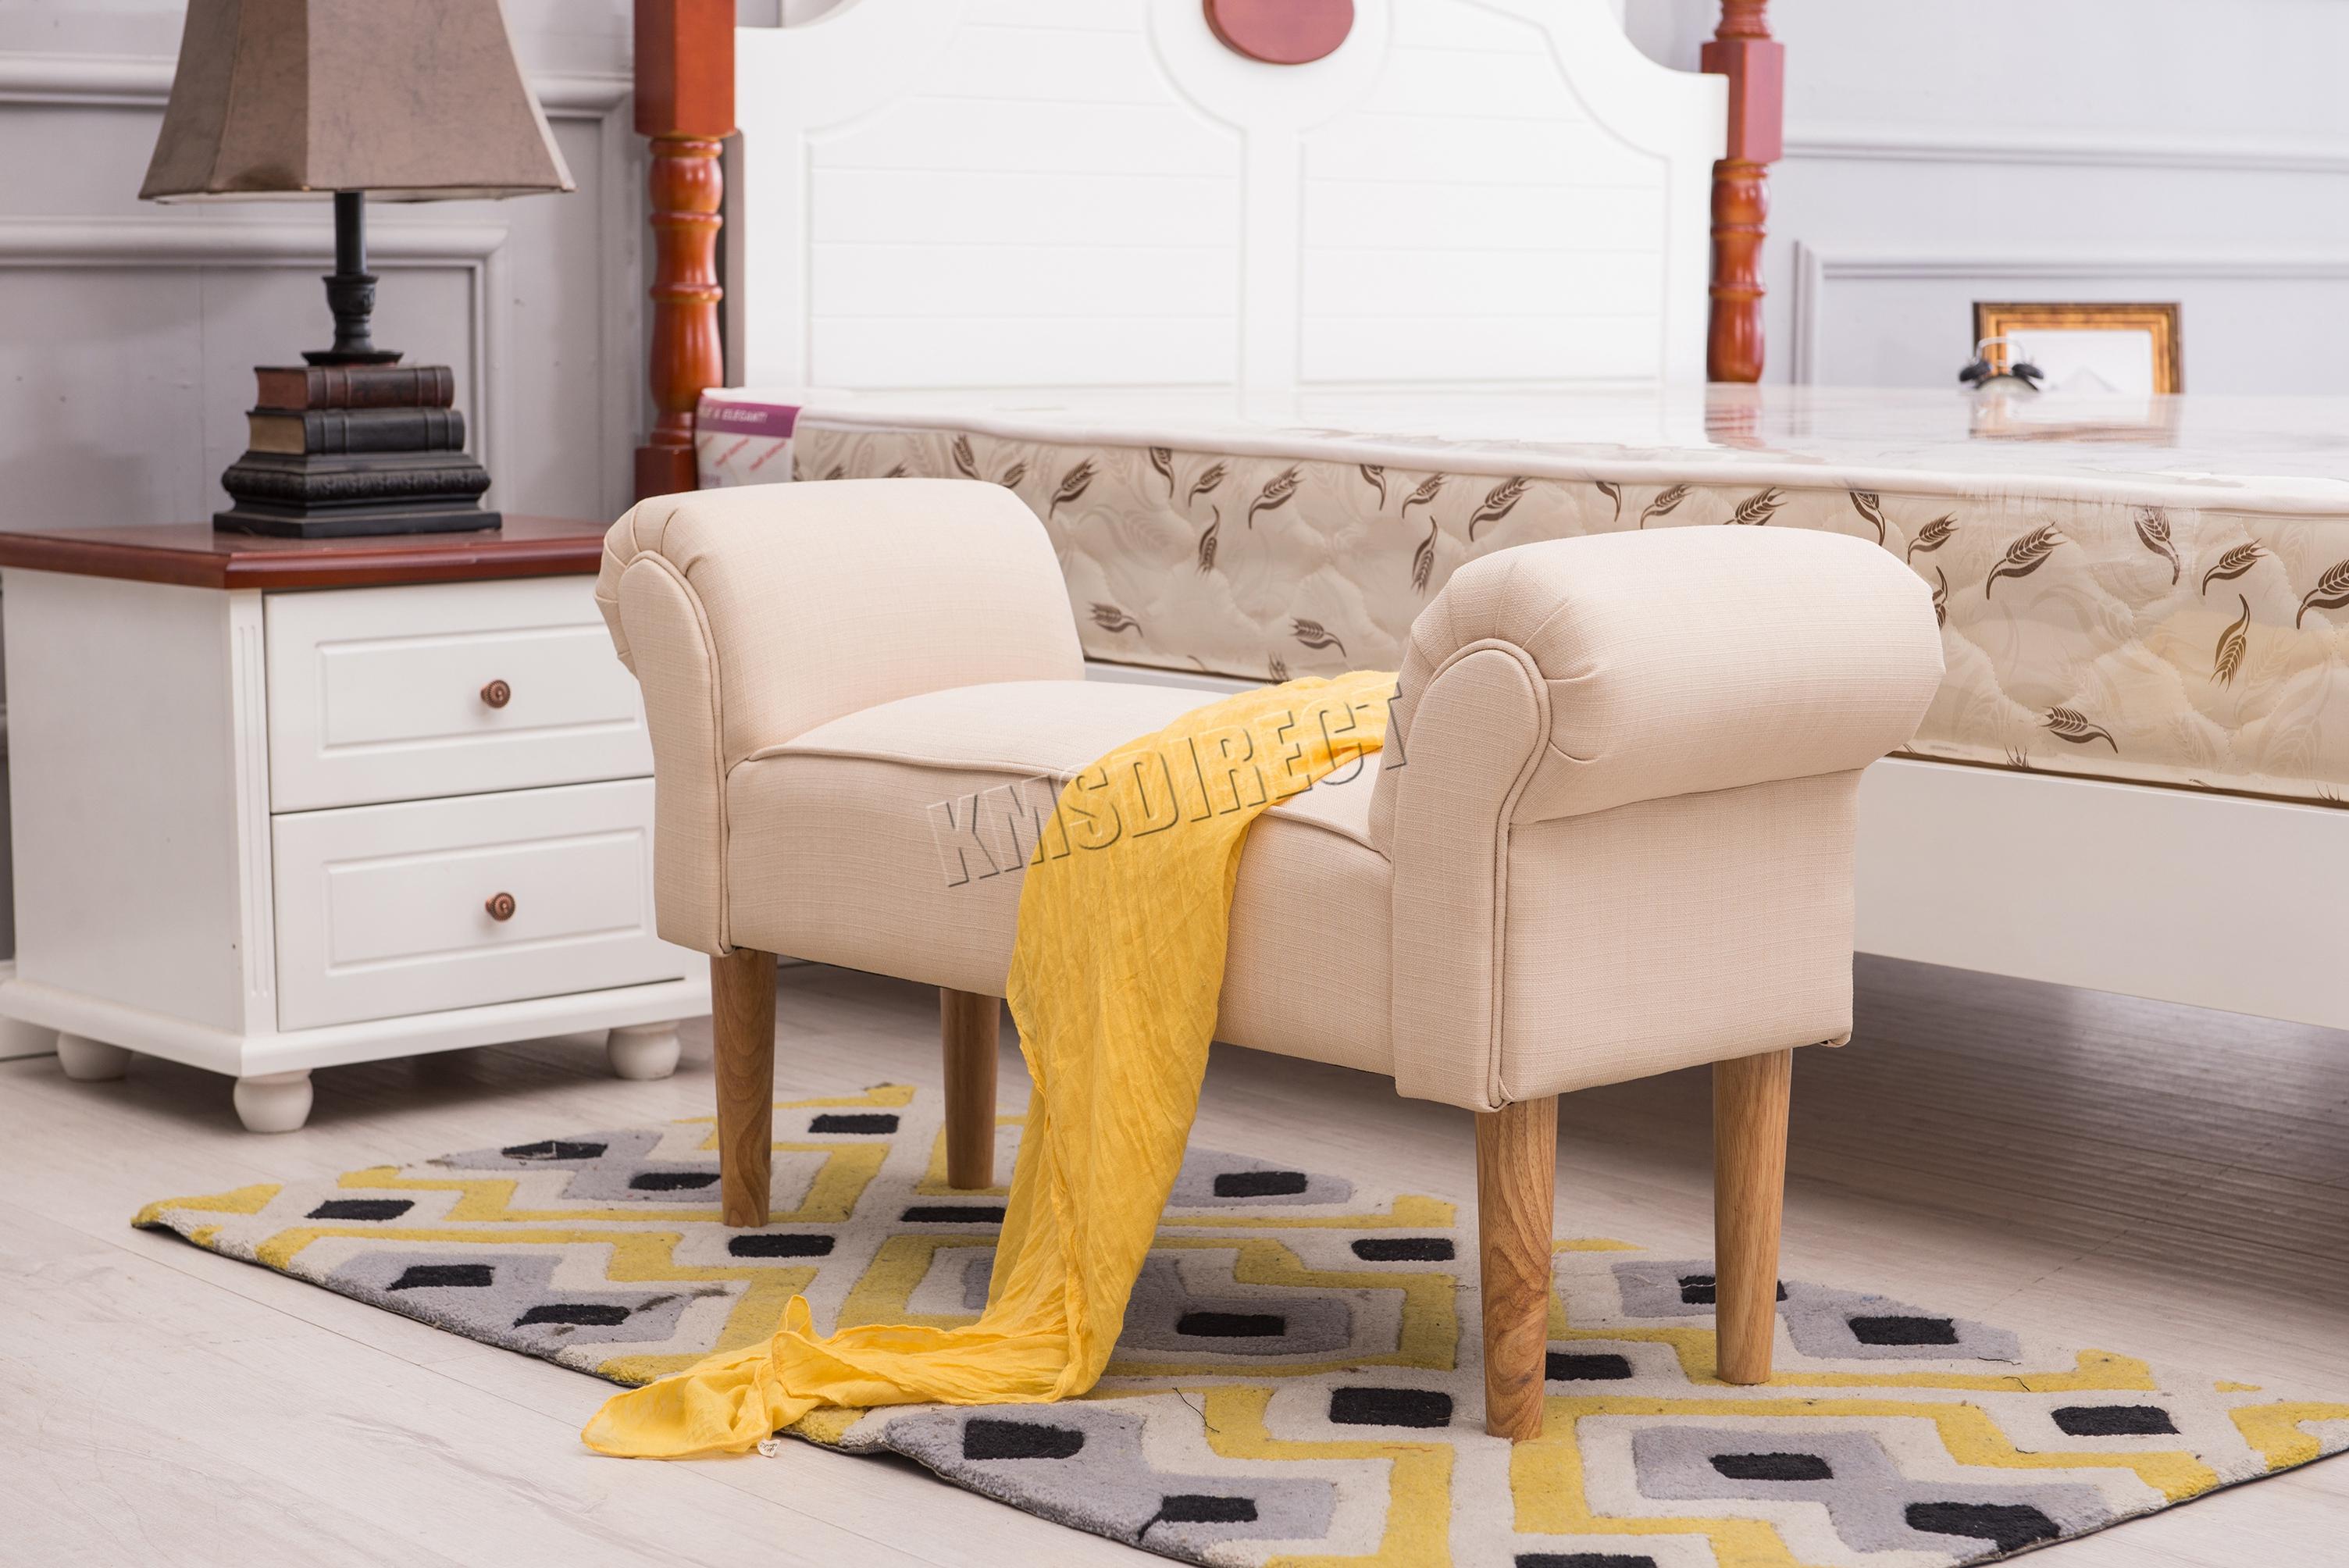 Sentinel FoxHunter Fabric Bench Footstool Seat Pouf Pouffee Ottoman Stool  Bedroom Cream